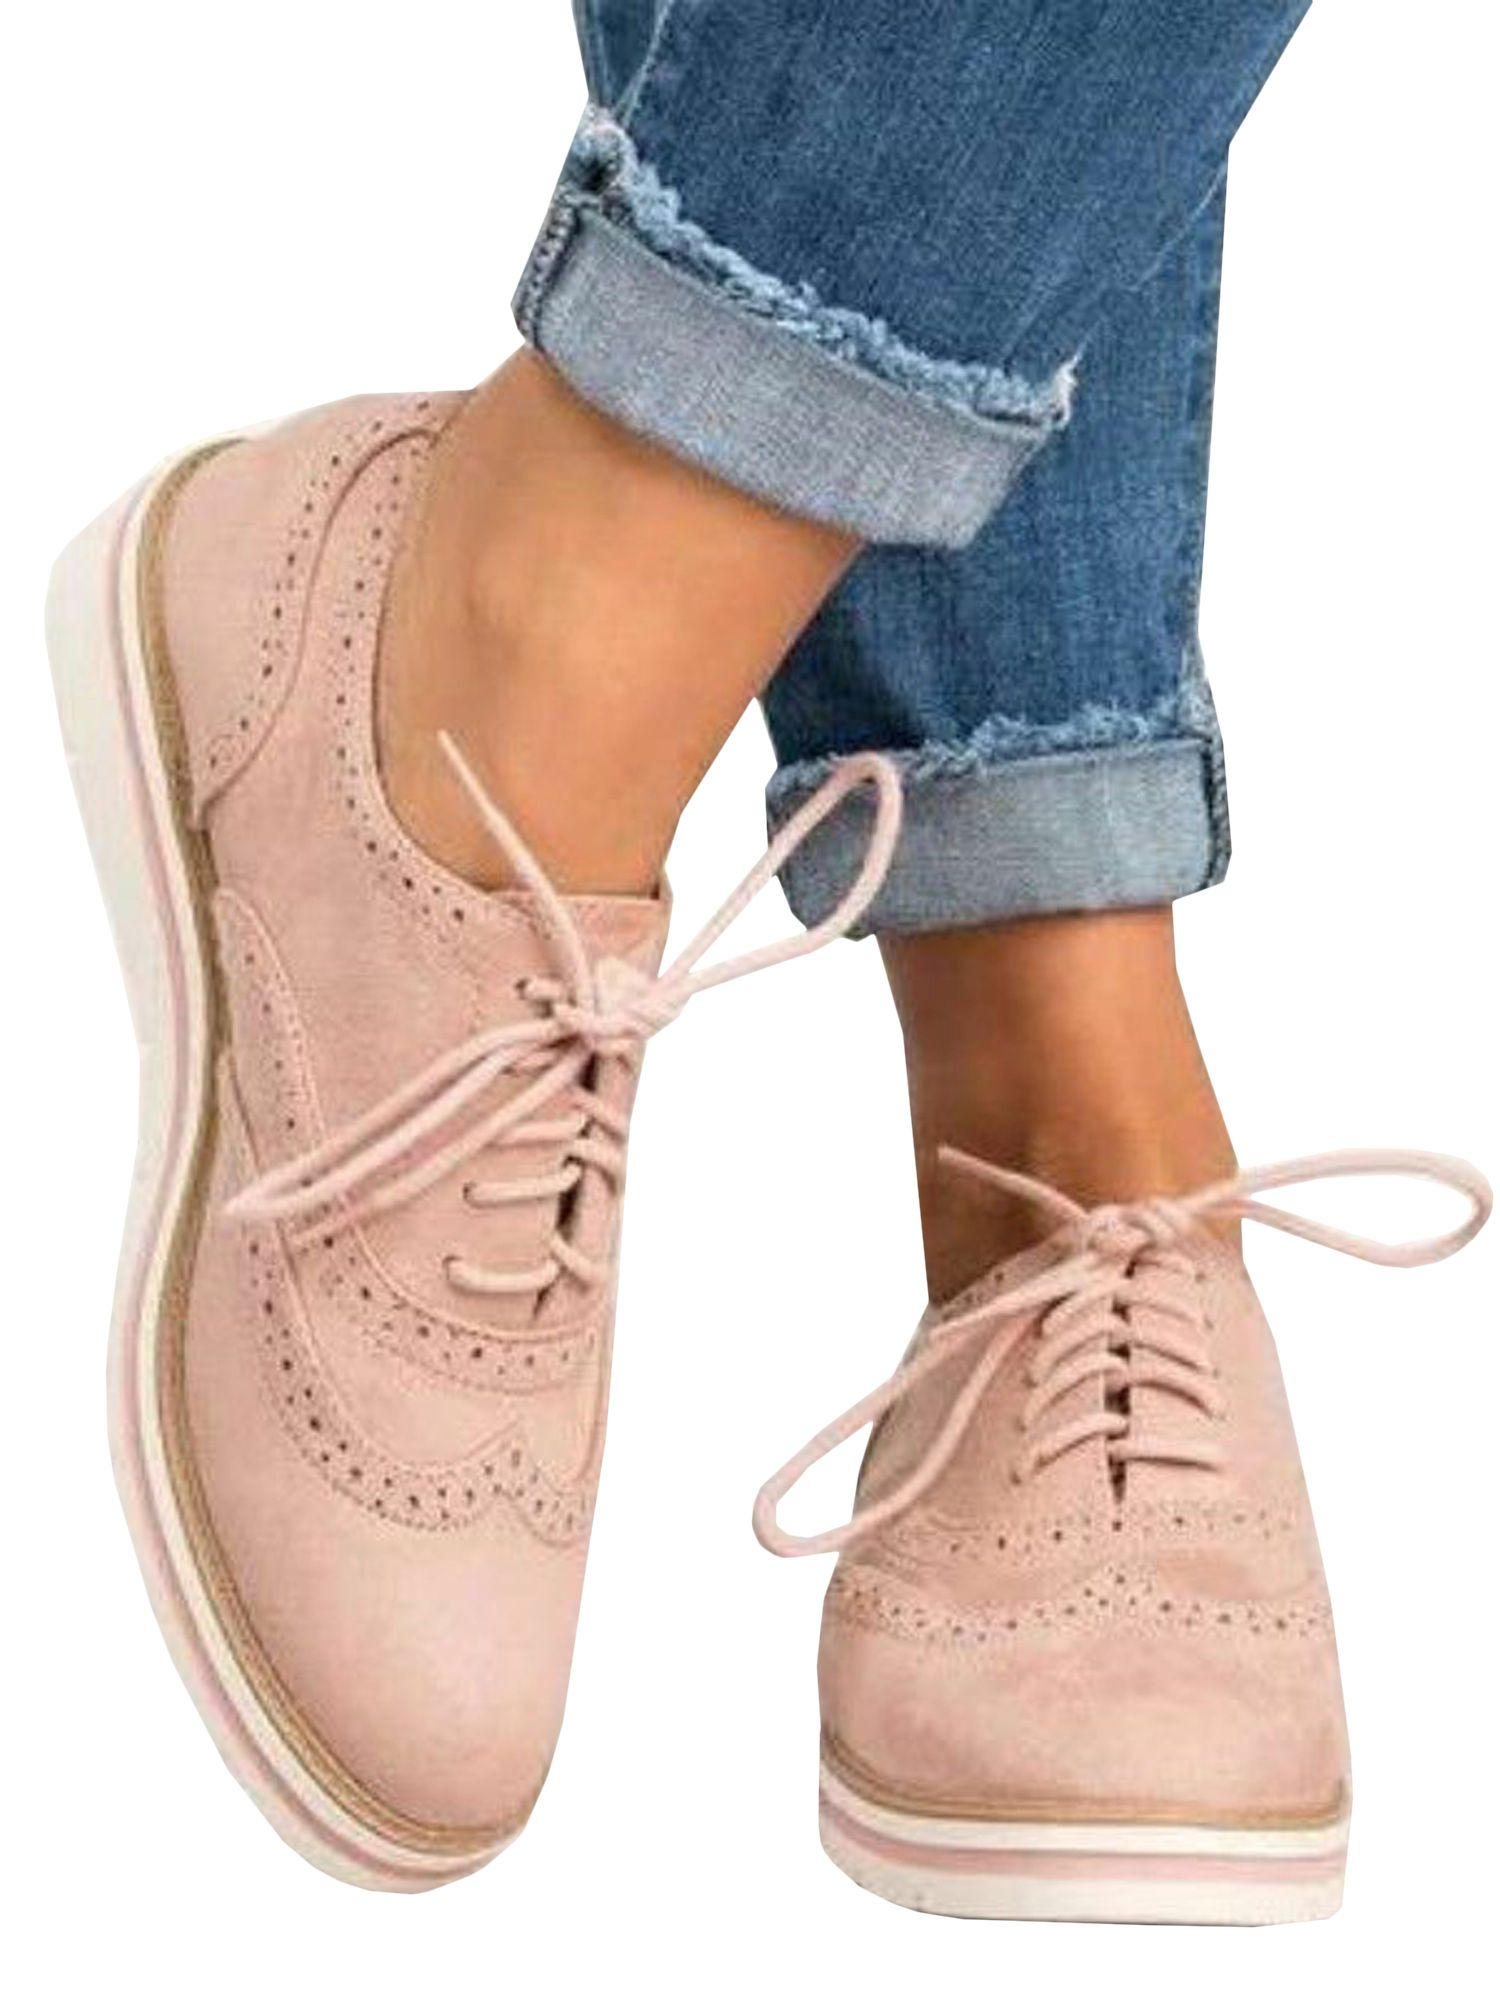 Lallc Women S Oxfords Lace Up Flat Smart Work Sports Brogue Trainers Casual Shoes Walmart Com In 2021 Casual Shoes Women Lace Up Shoes Women Shoes [ 2000 x 1500 Pixel ]